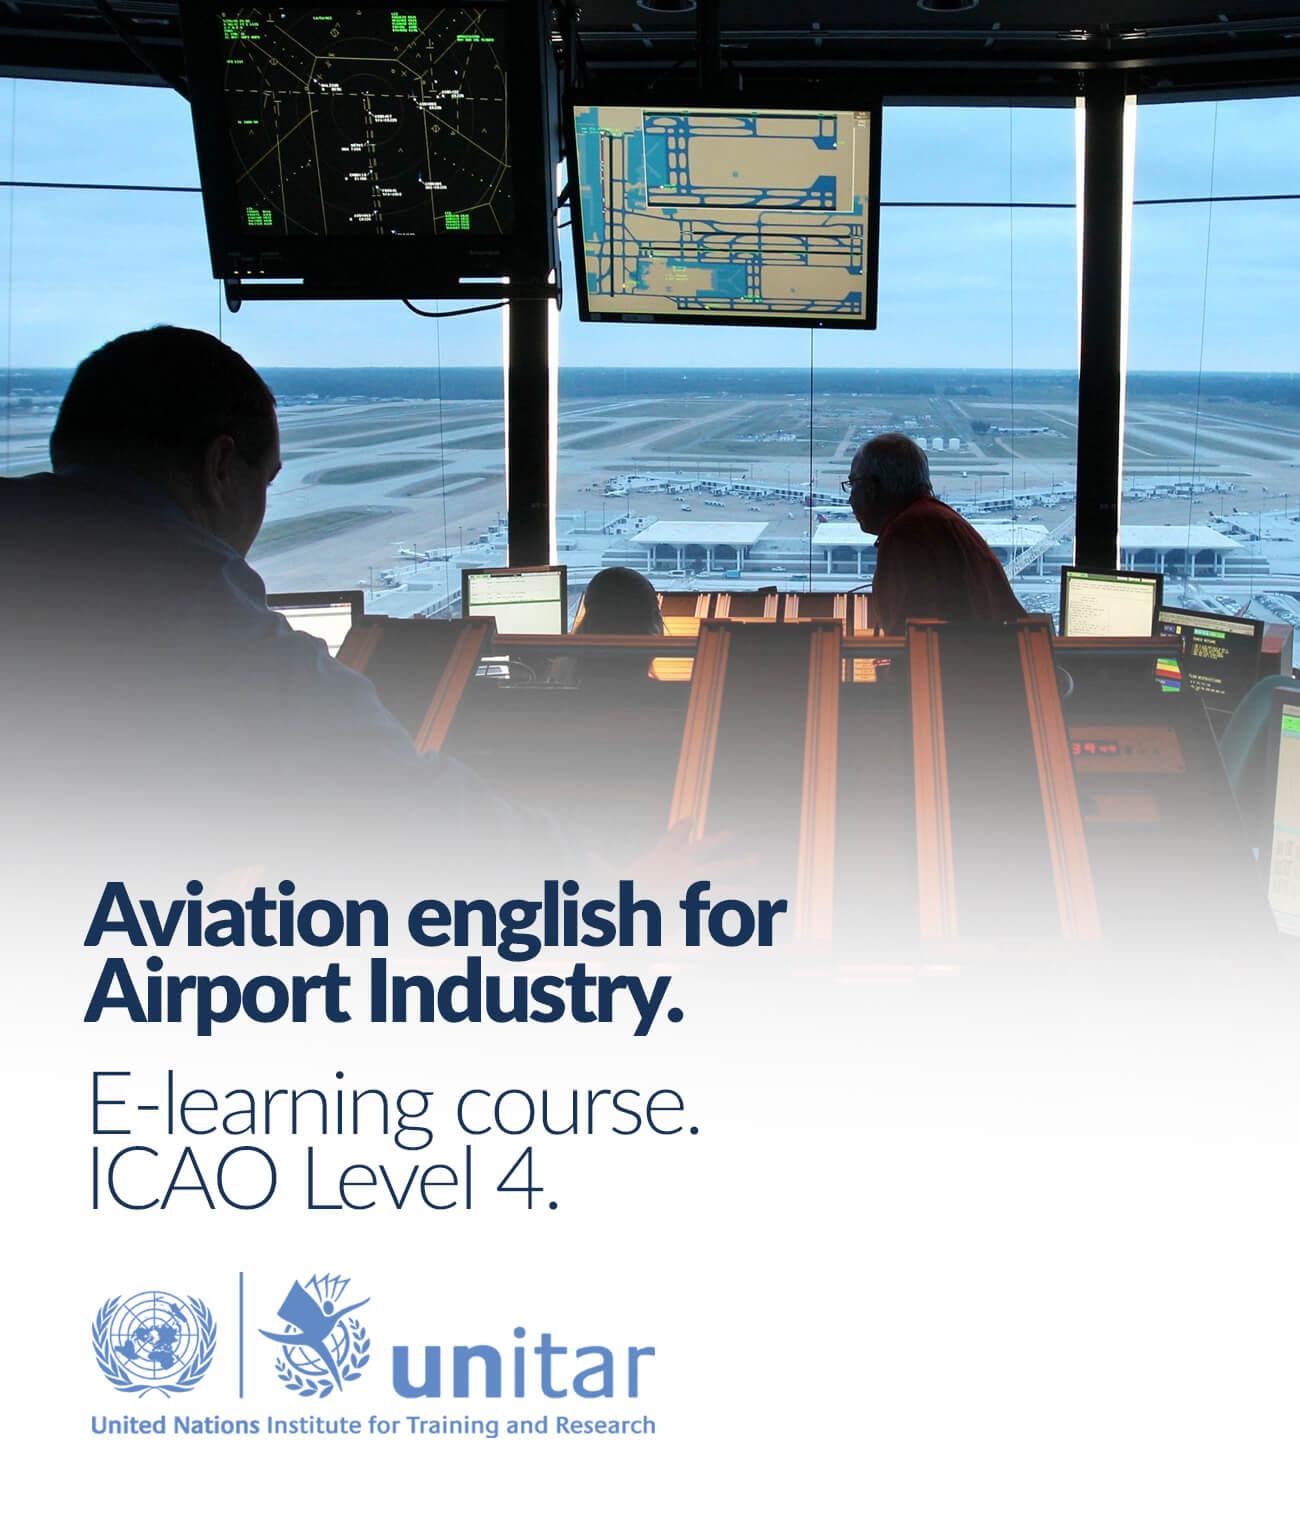 aviation english itaerea mv - Home